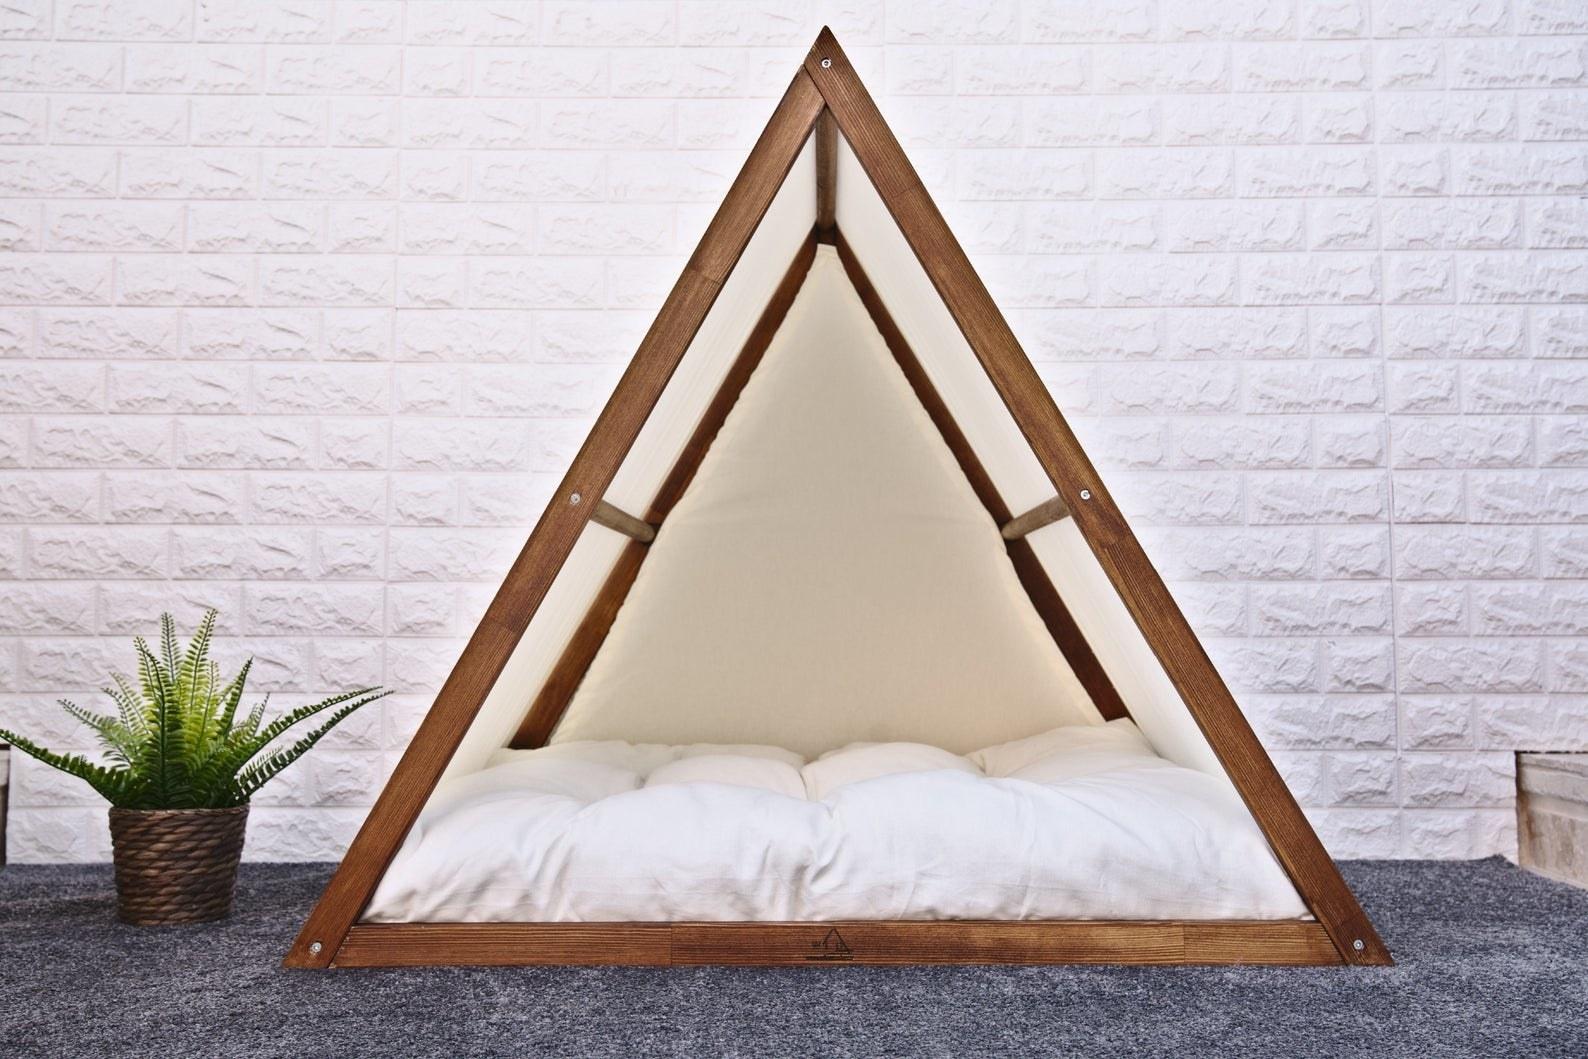 a triangular walnut dog house with a white cushion inside